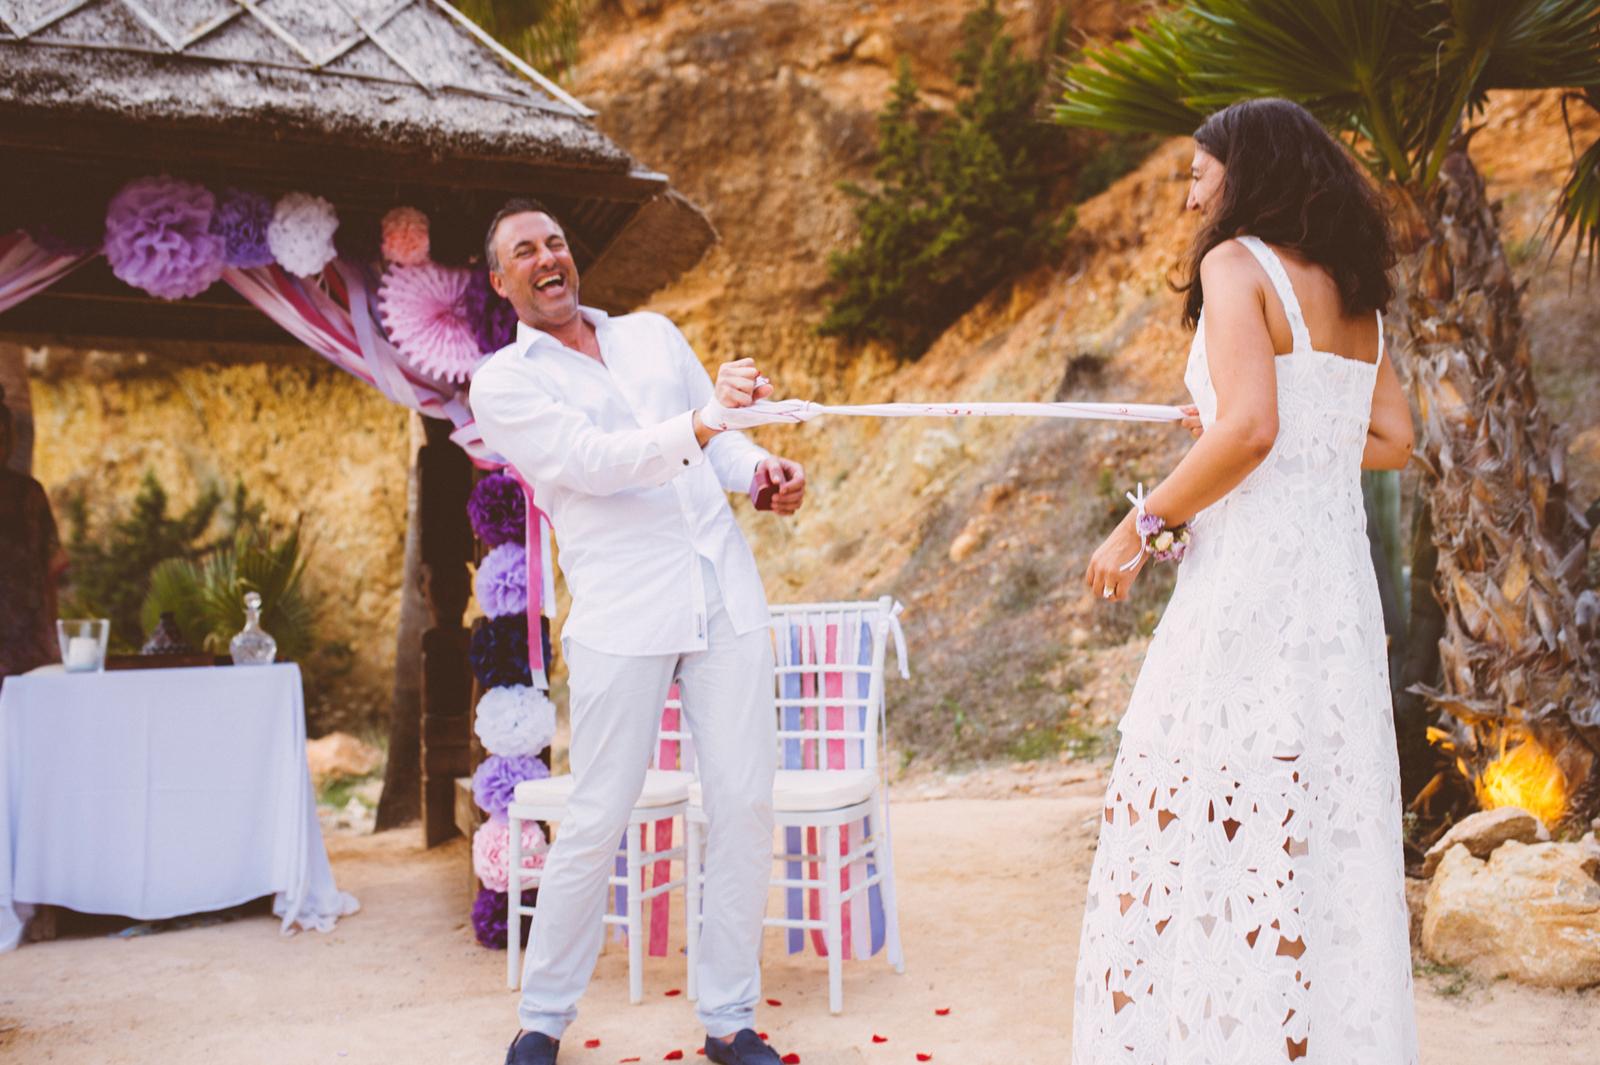 Hochzeitsfotograf_Ibiza_144.jpg